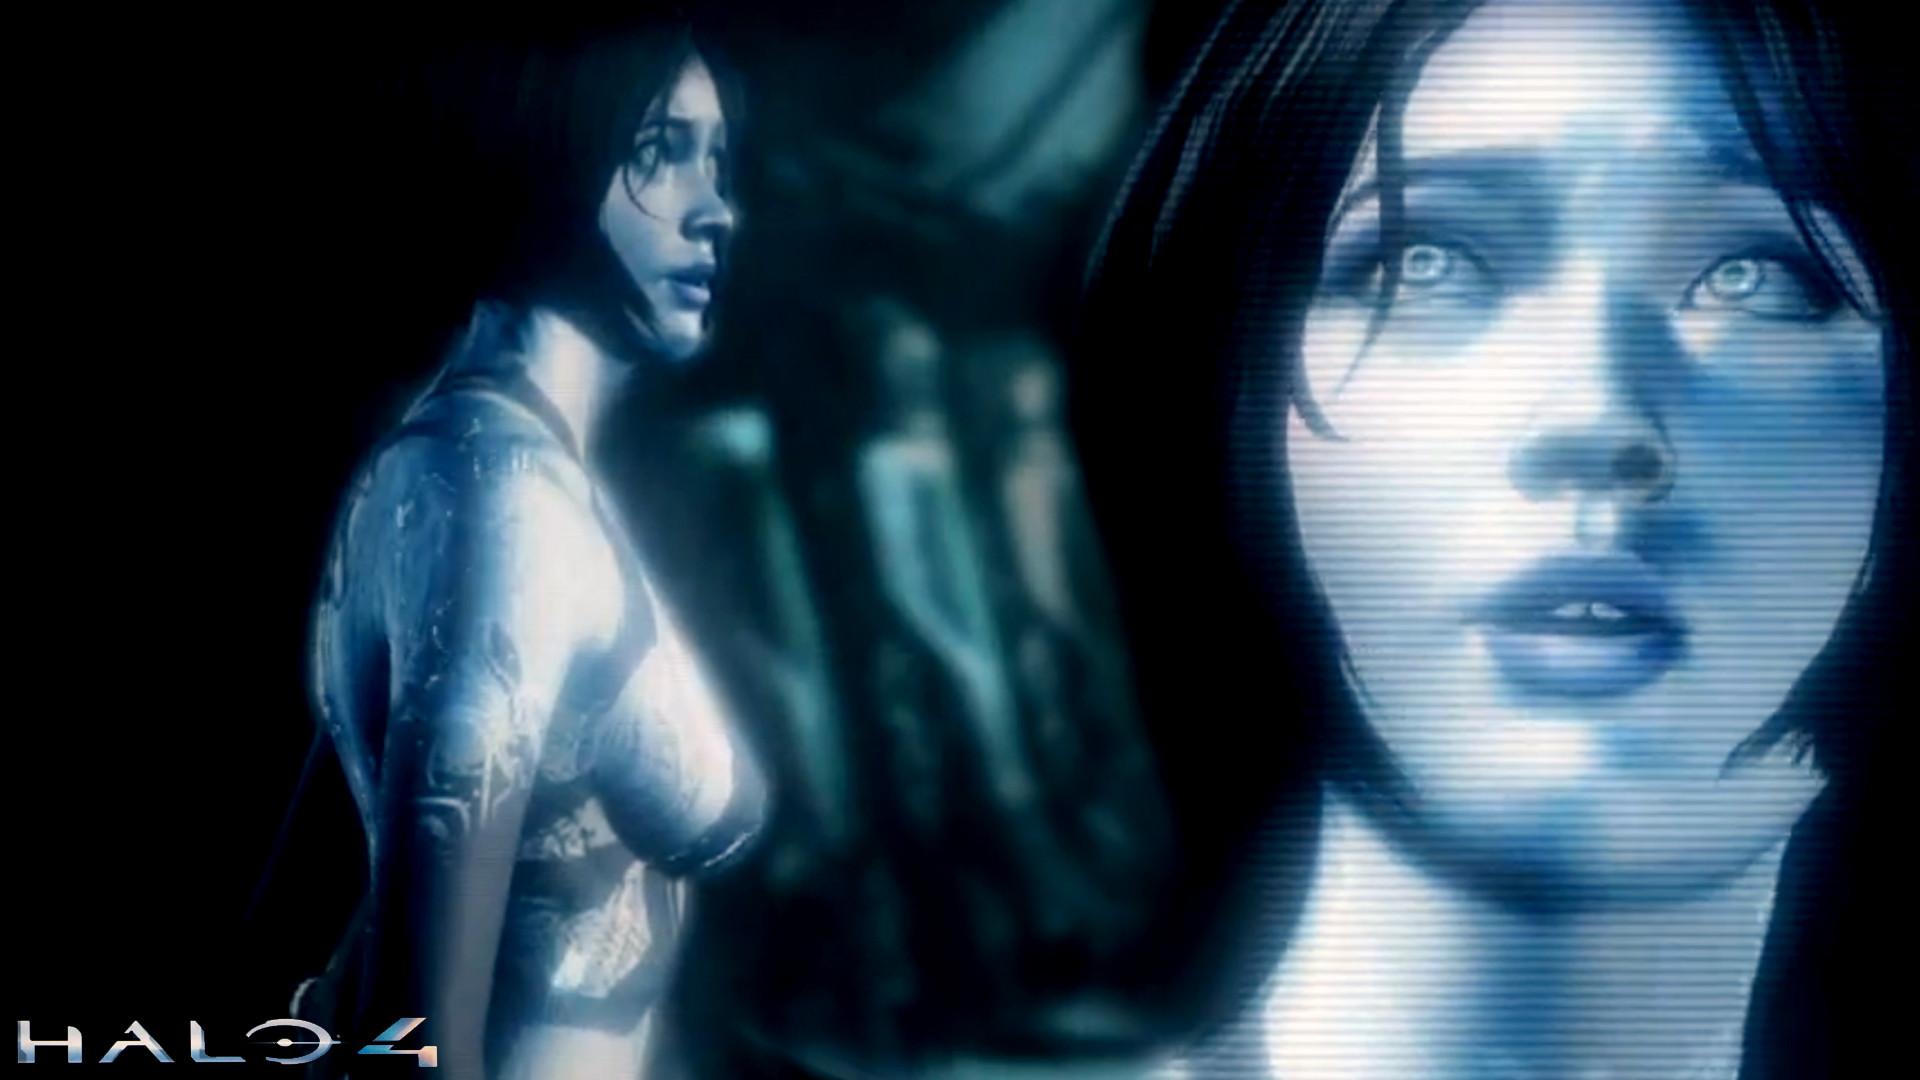 Halo 4 Cortana Wallpaper